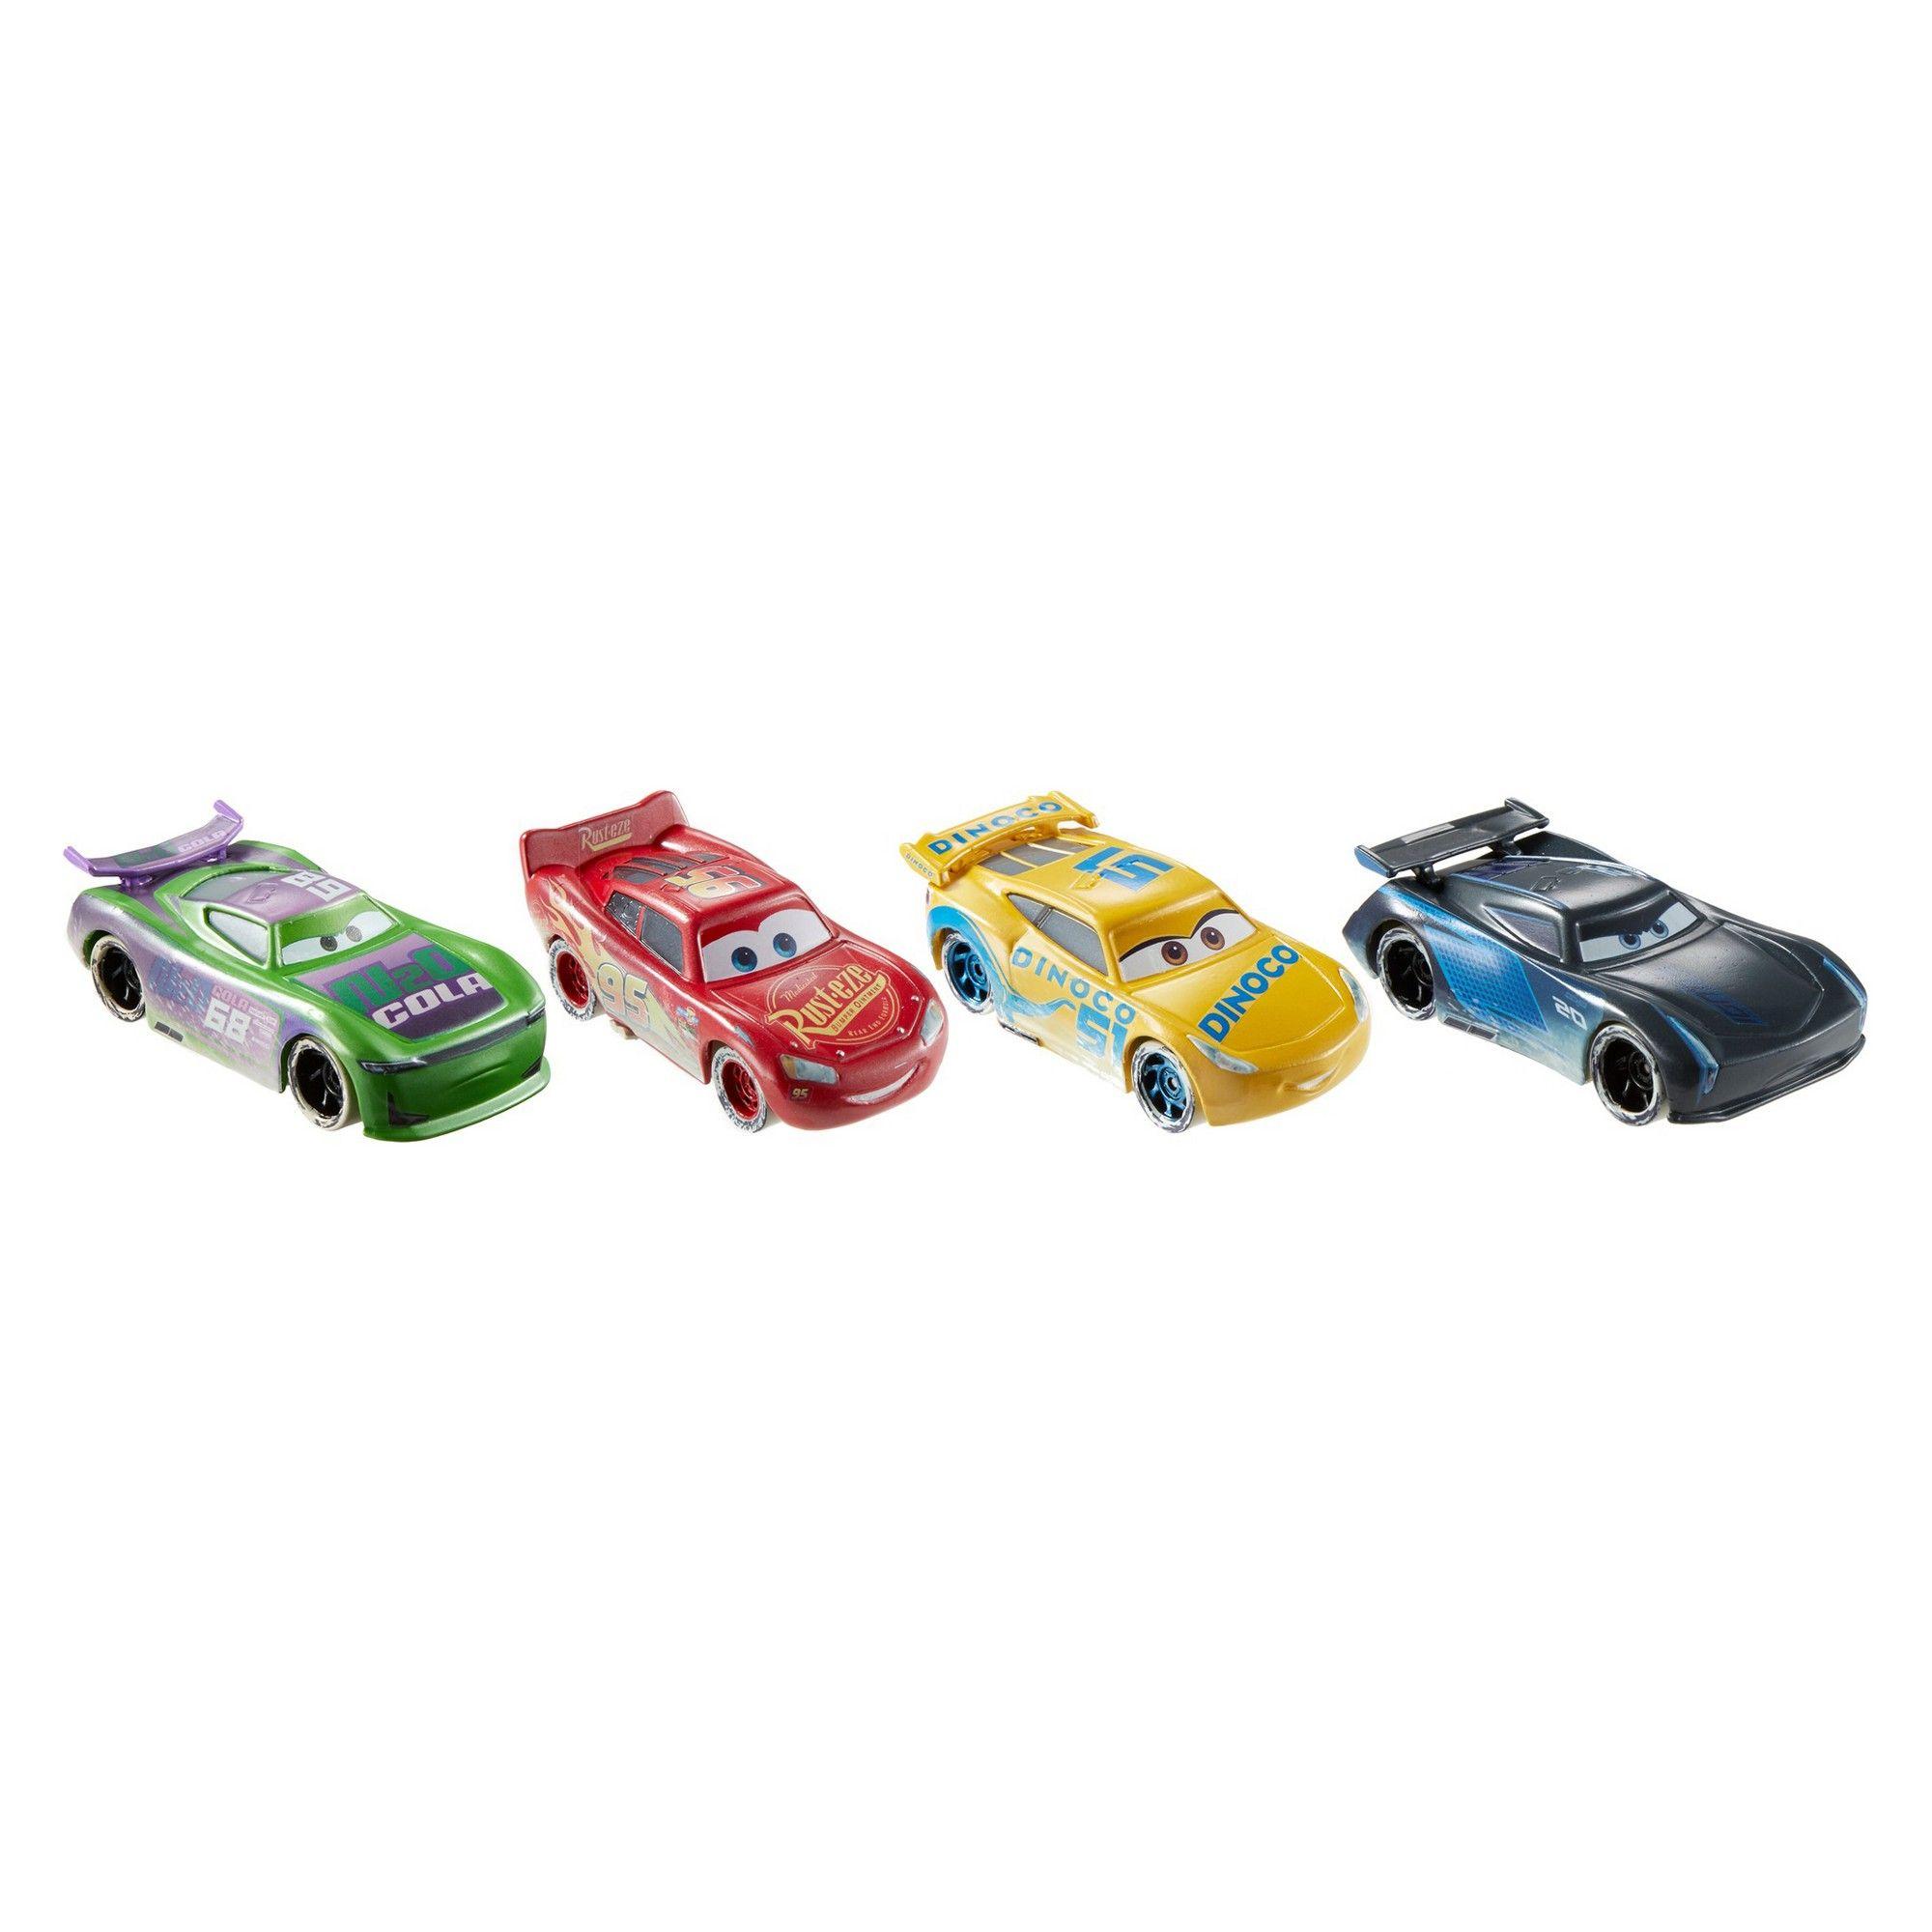 Disney Pixar Cars Fireball Beach Racers Beach Racing 4pk Disney Pixar Cars Pixar Cars Disney Pixar